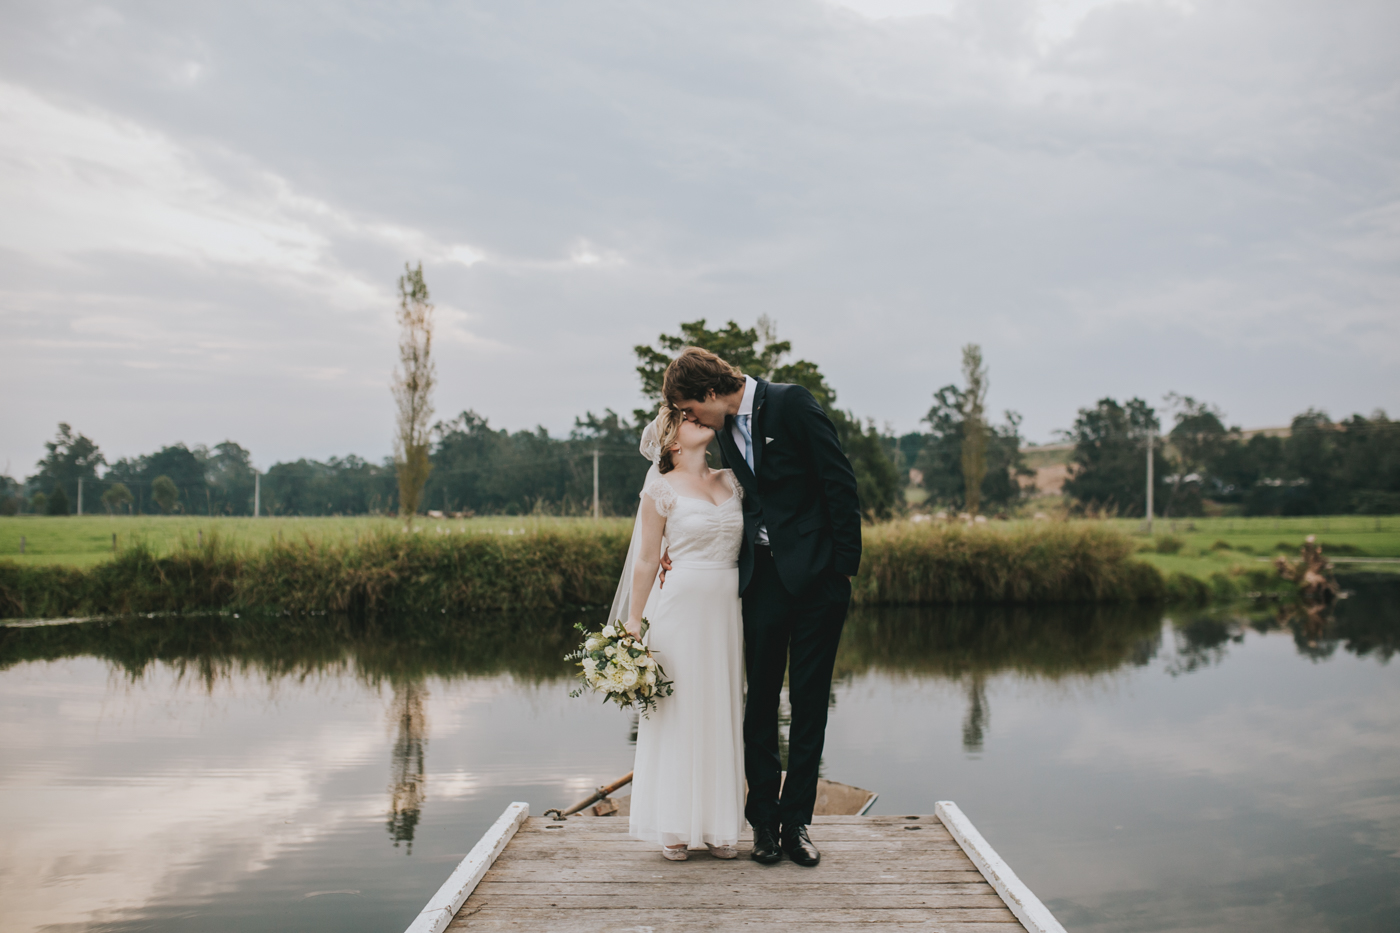 Rachel & Jacob - Willow Farm Berry - South Coast Wedding - Samantha Heather Photography-127.jpg